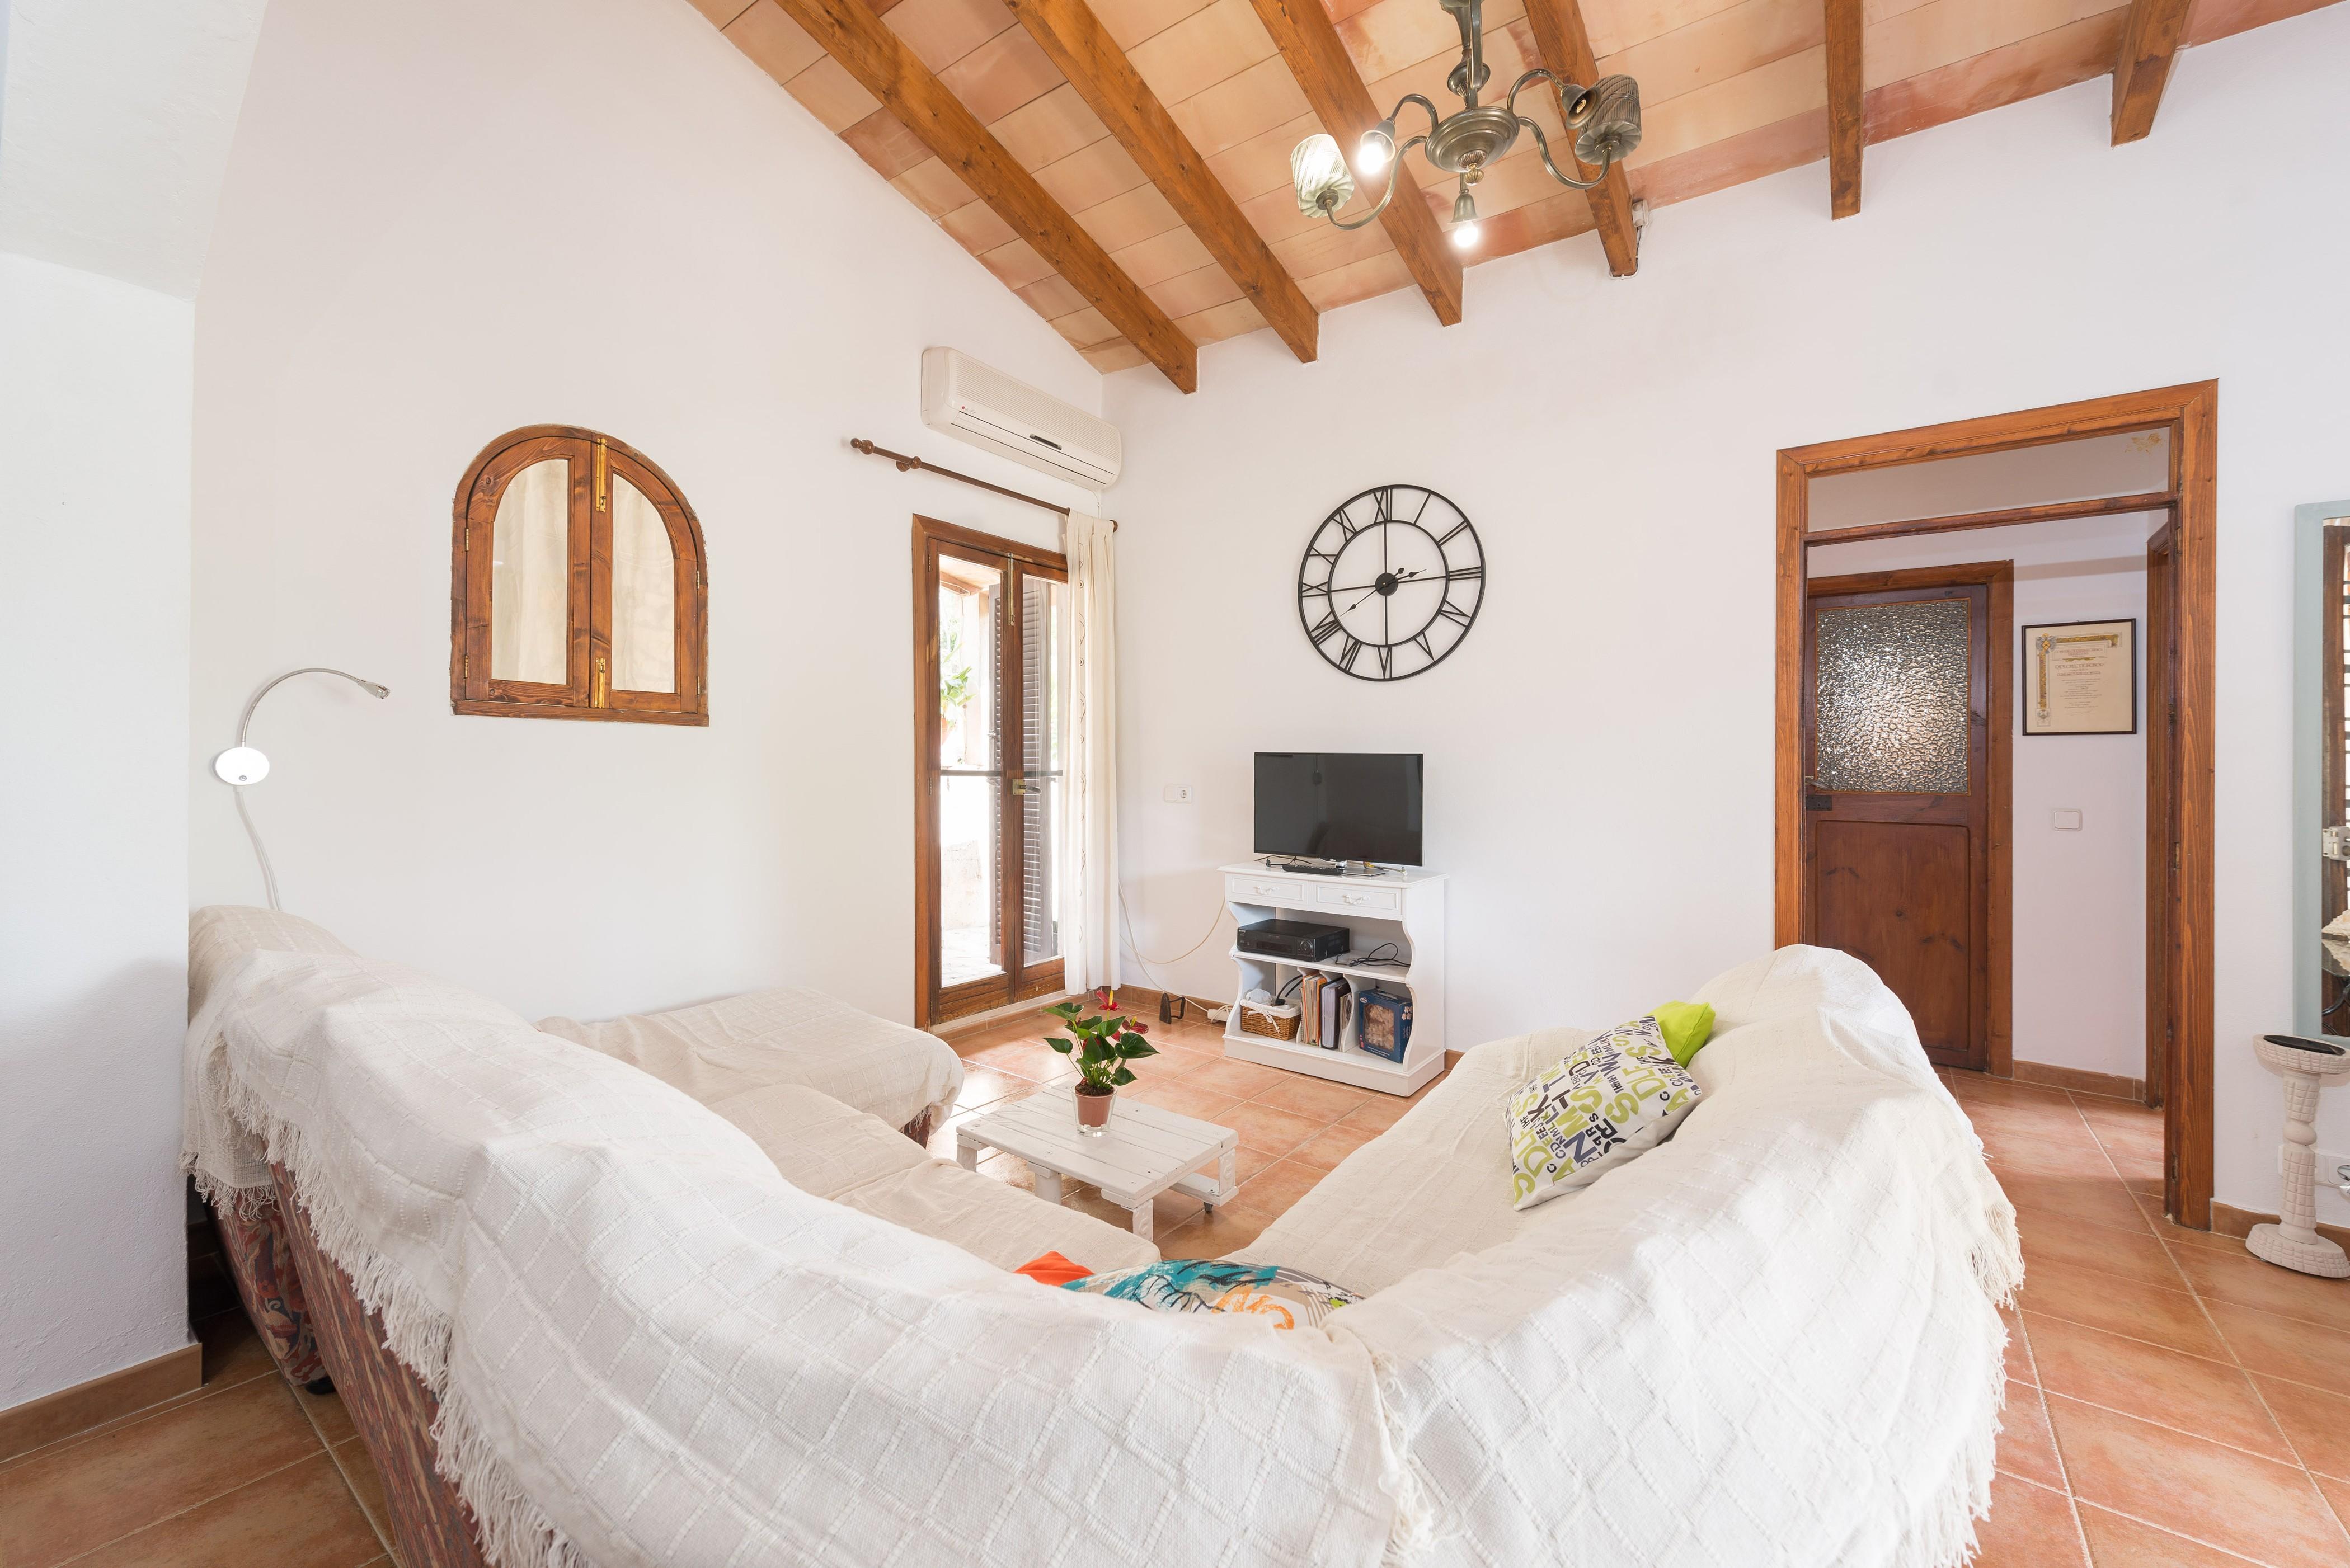 Ferienhaus SON DURINET (2302802), Mancor de la Vall, Mallorca, Balearische Inseln, Spanien, Bild 17